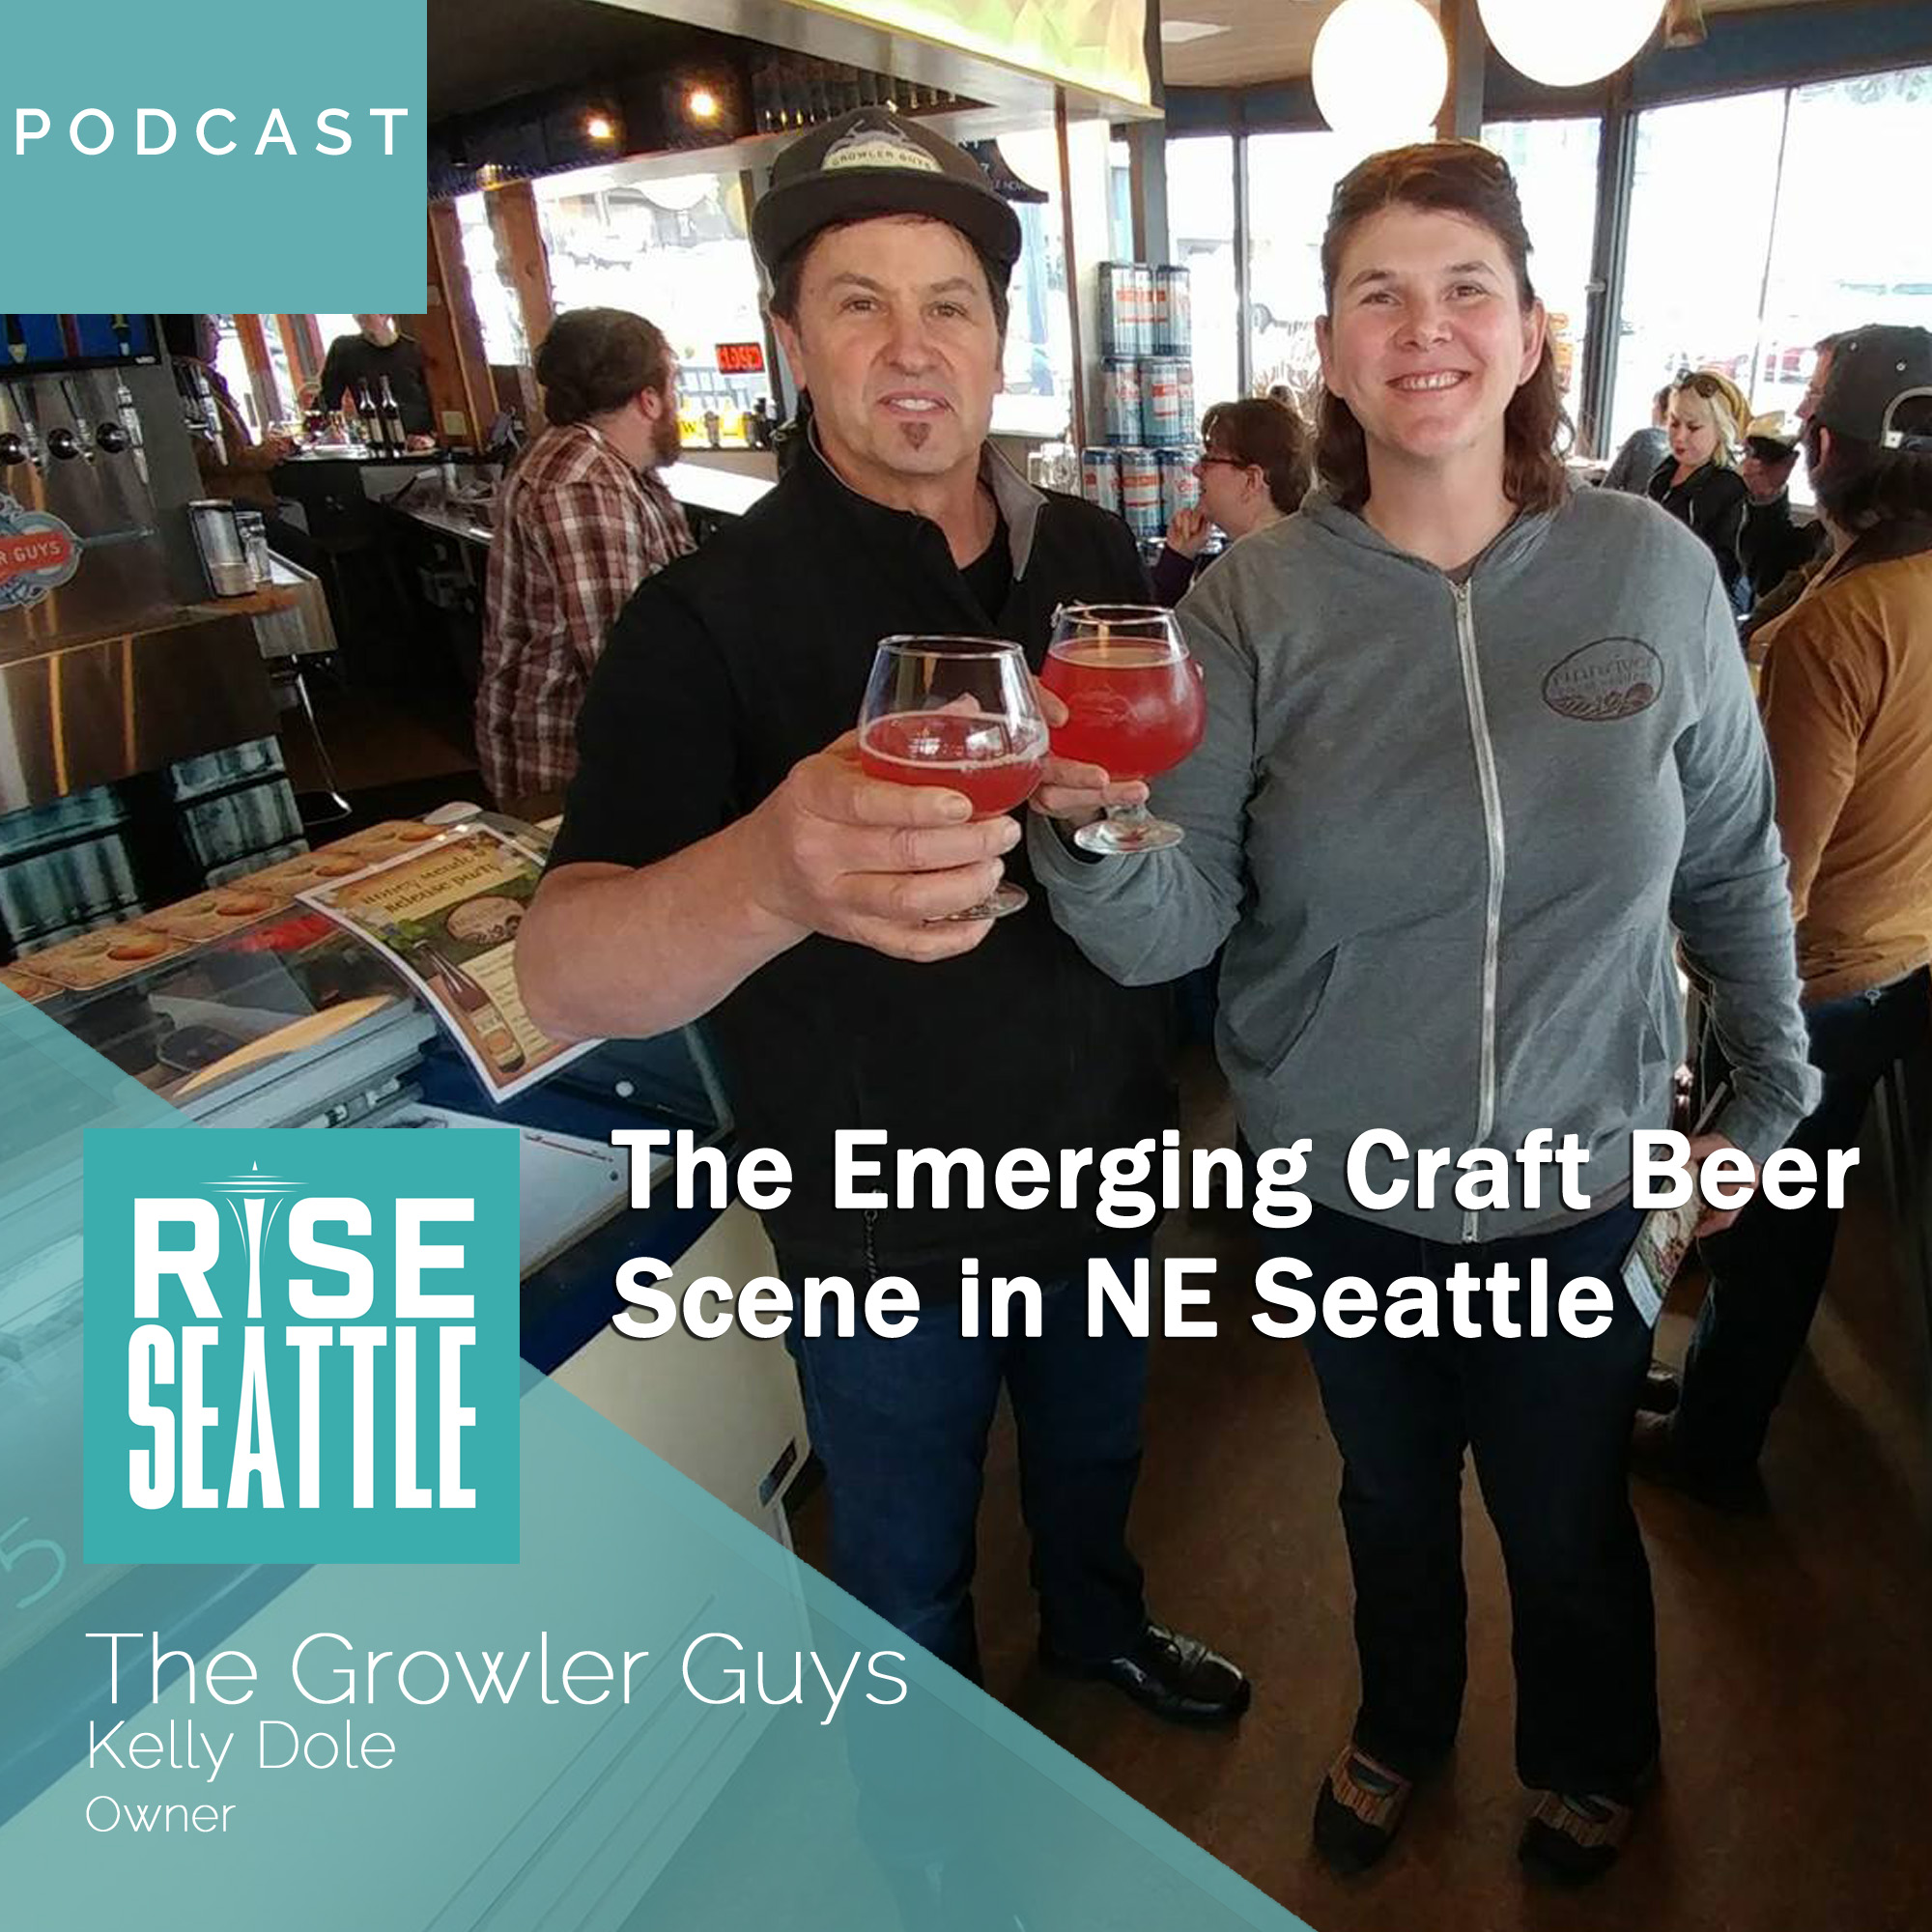 S1.E12. Kelly Dole of Growler Guys: Craft Beer in NE Seattle